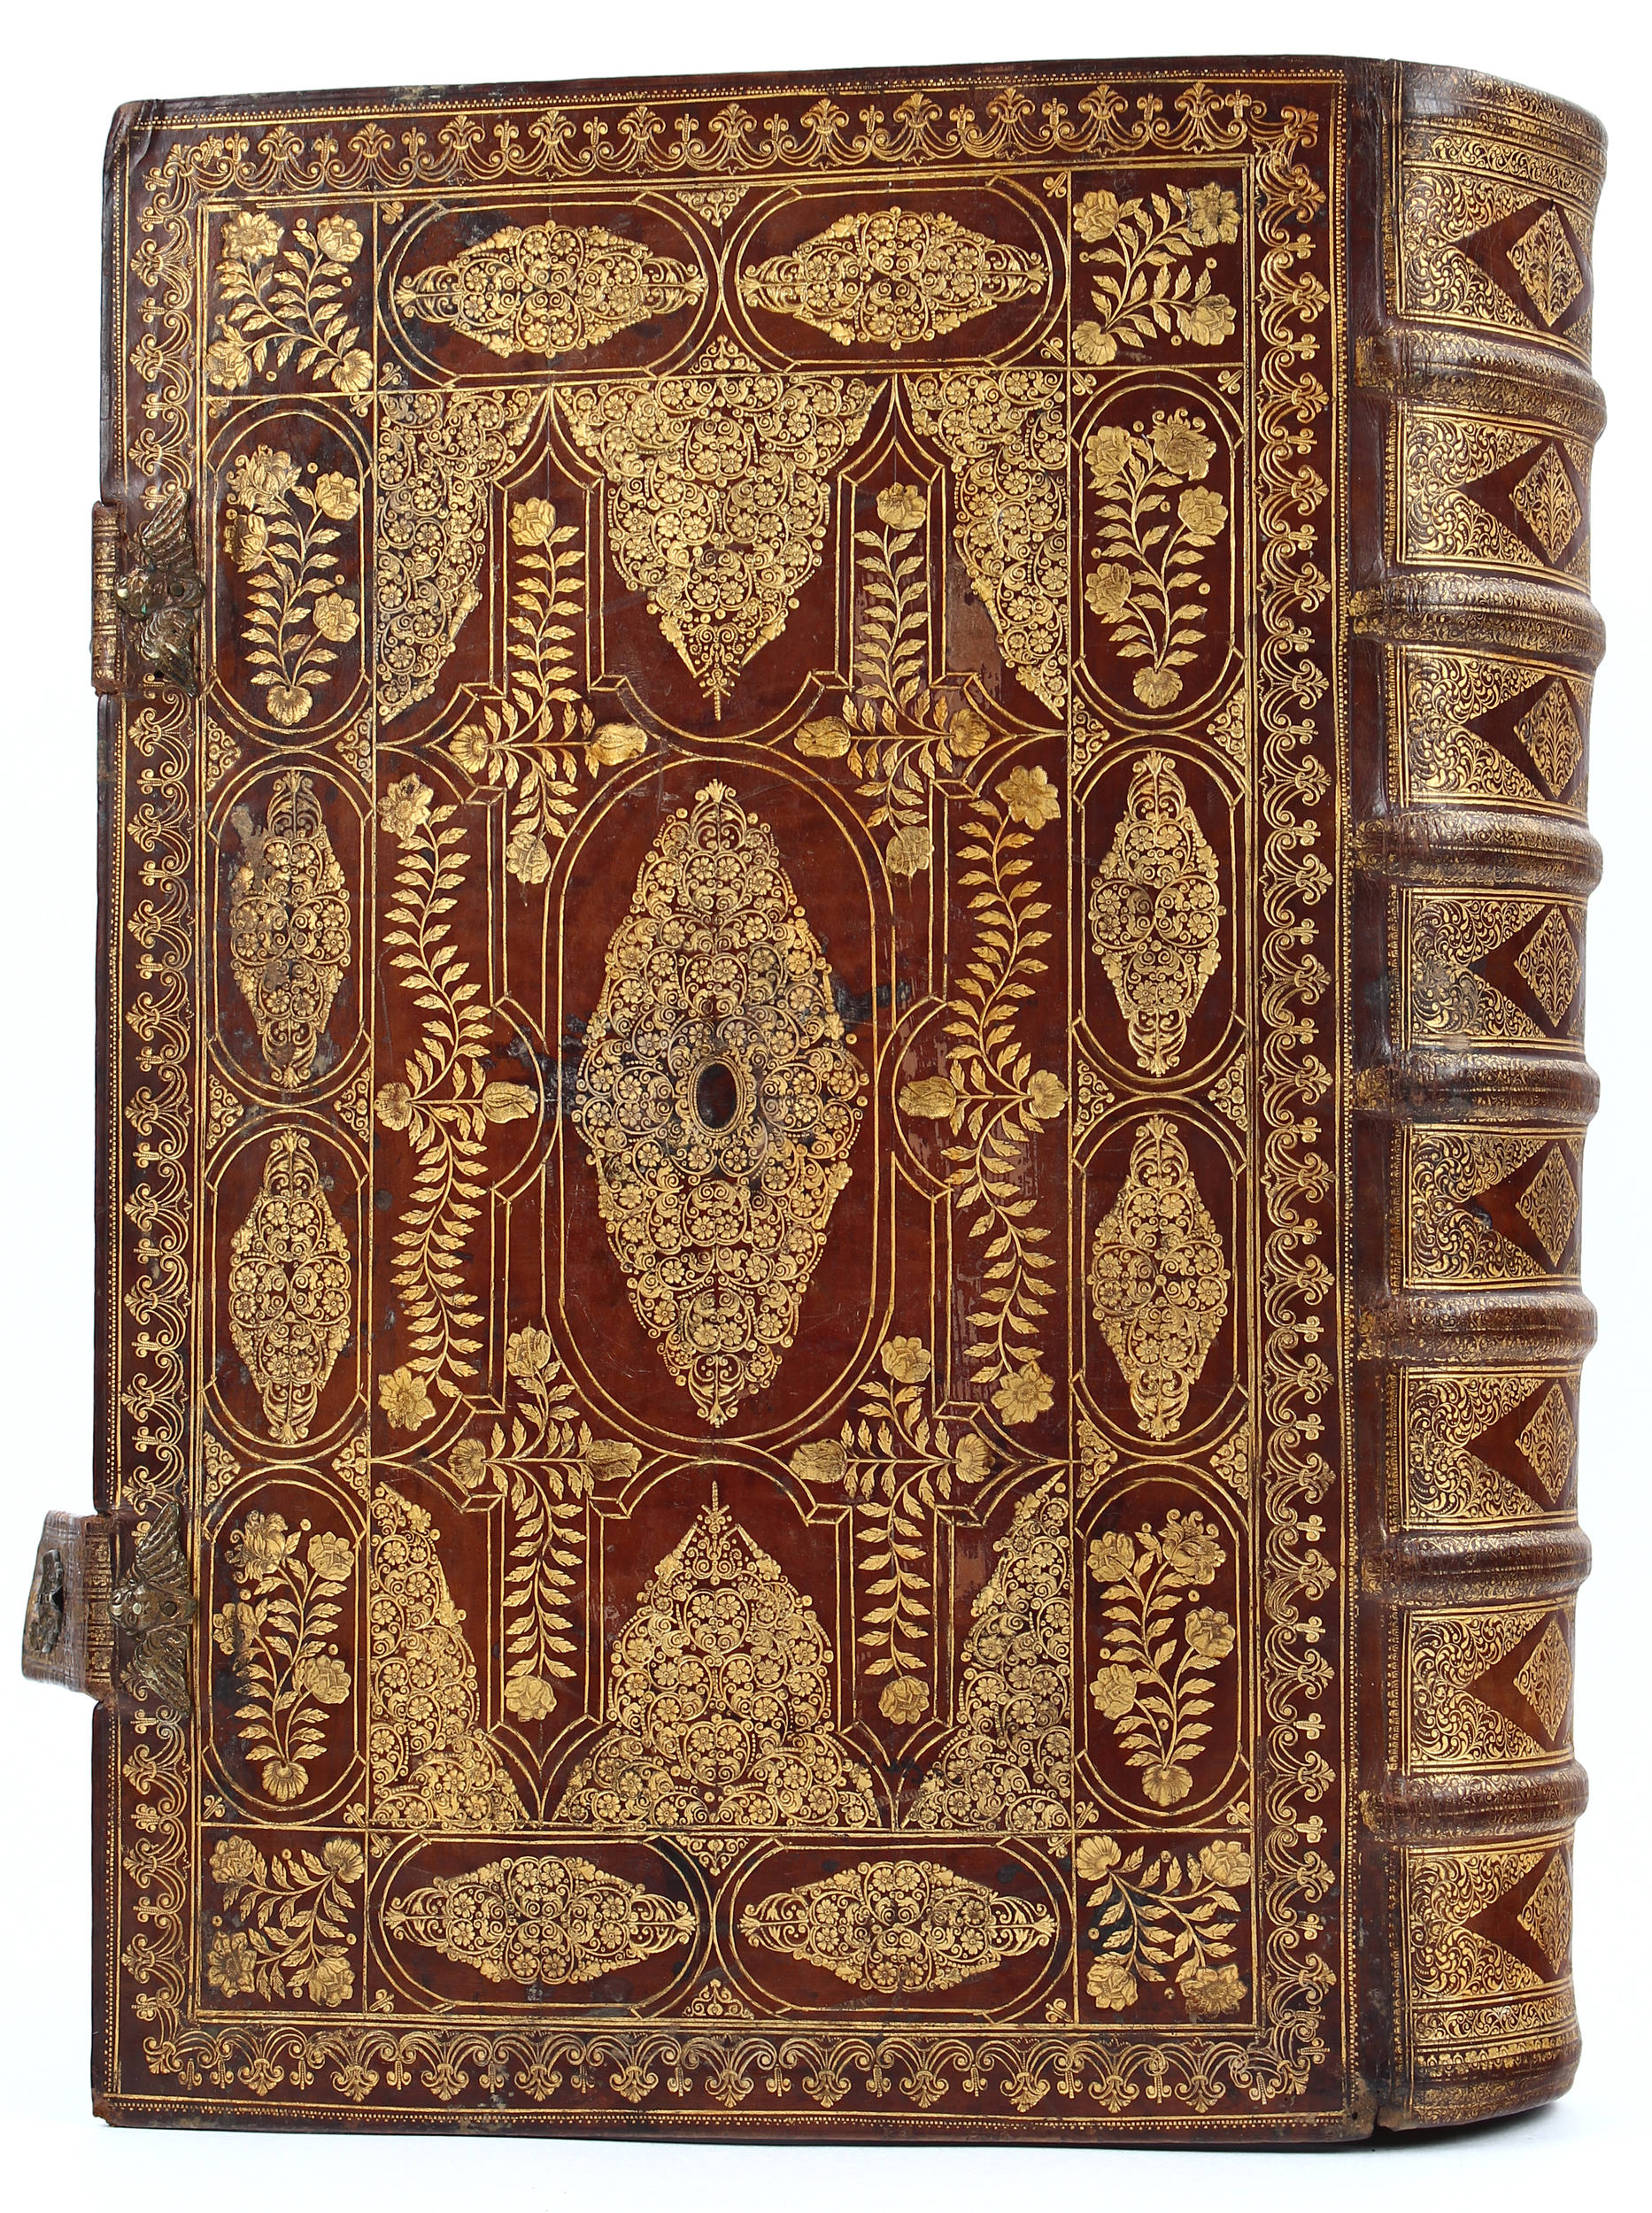 Biblia germanica. Nürnberg 1700